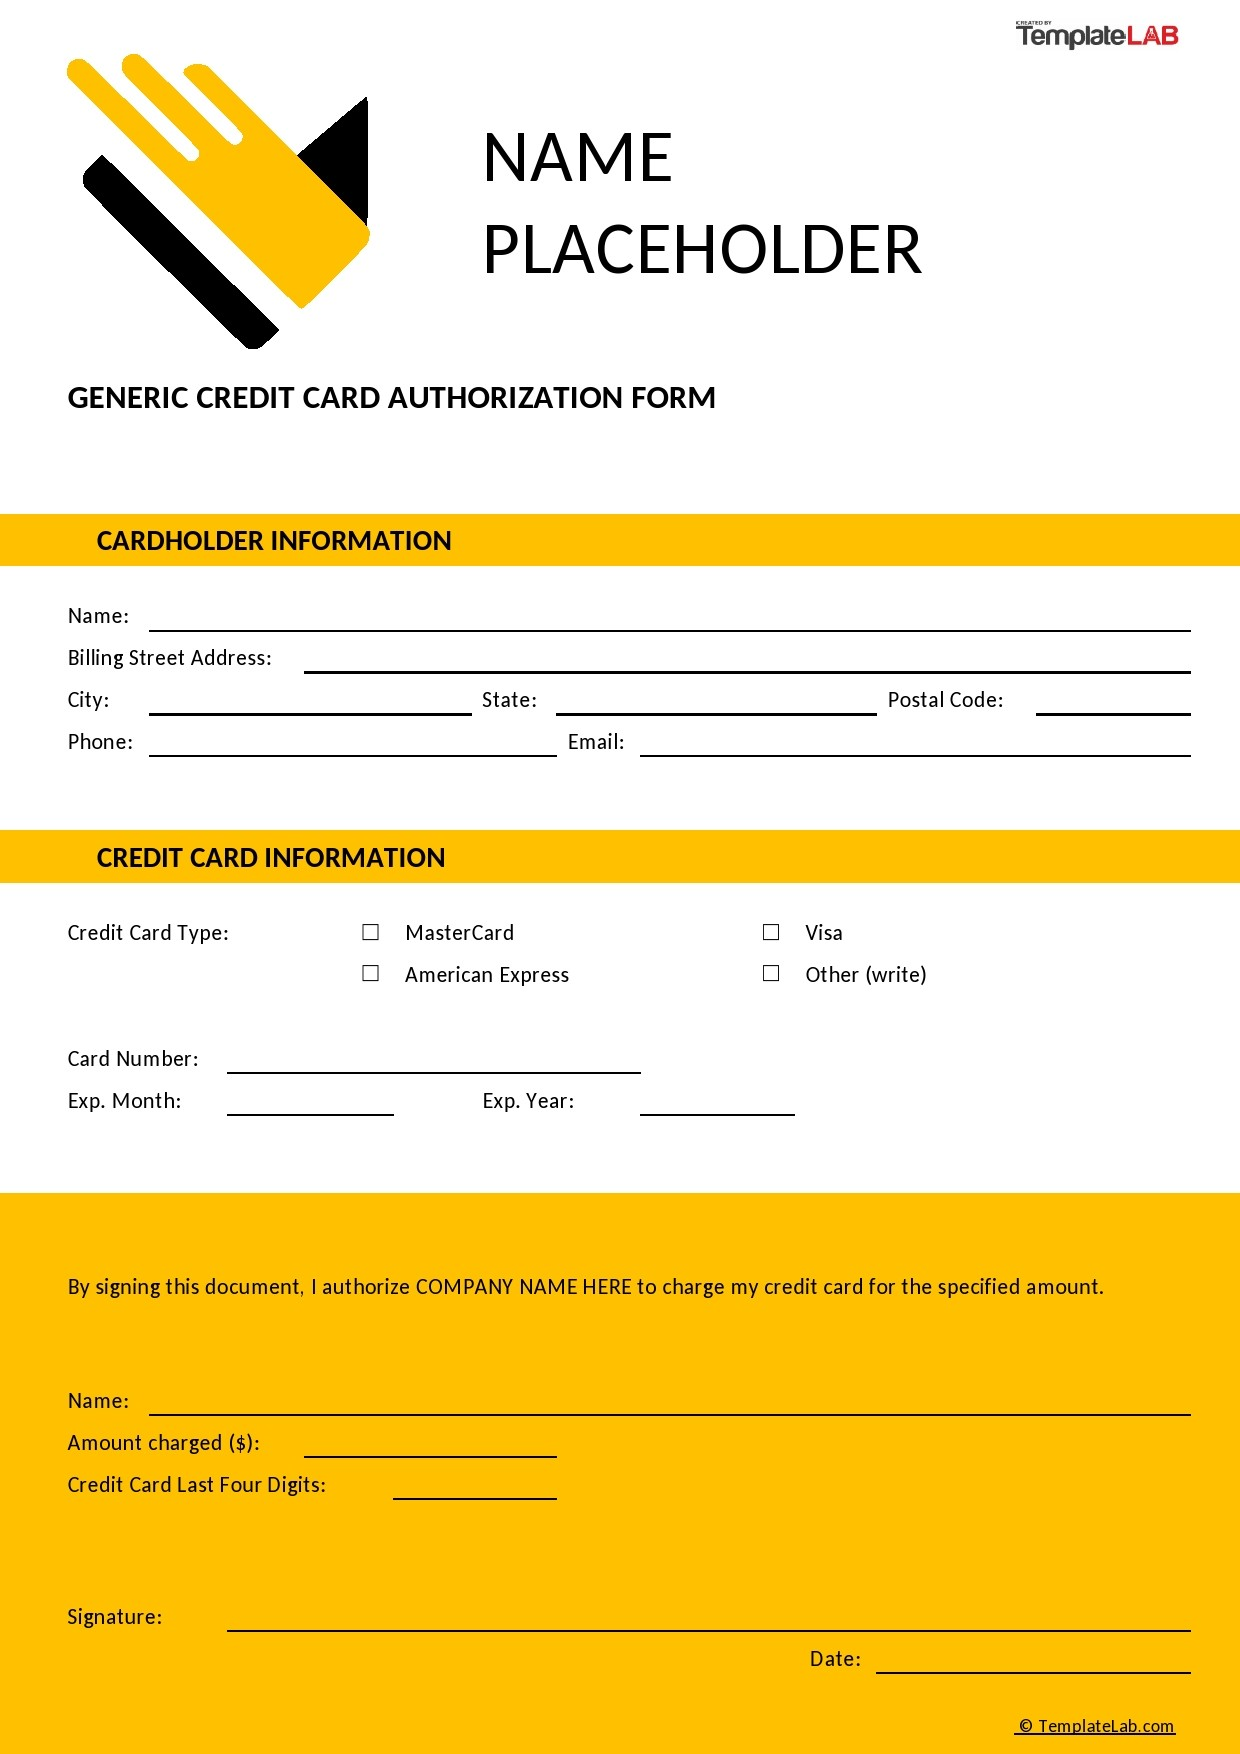 Free Generic Credit Card Authorization Form - TemplateLab.com